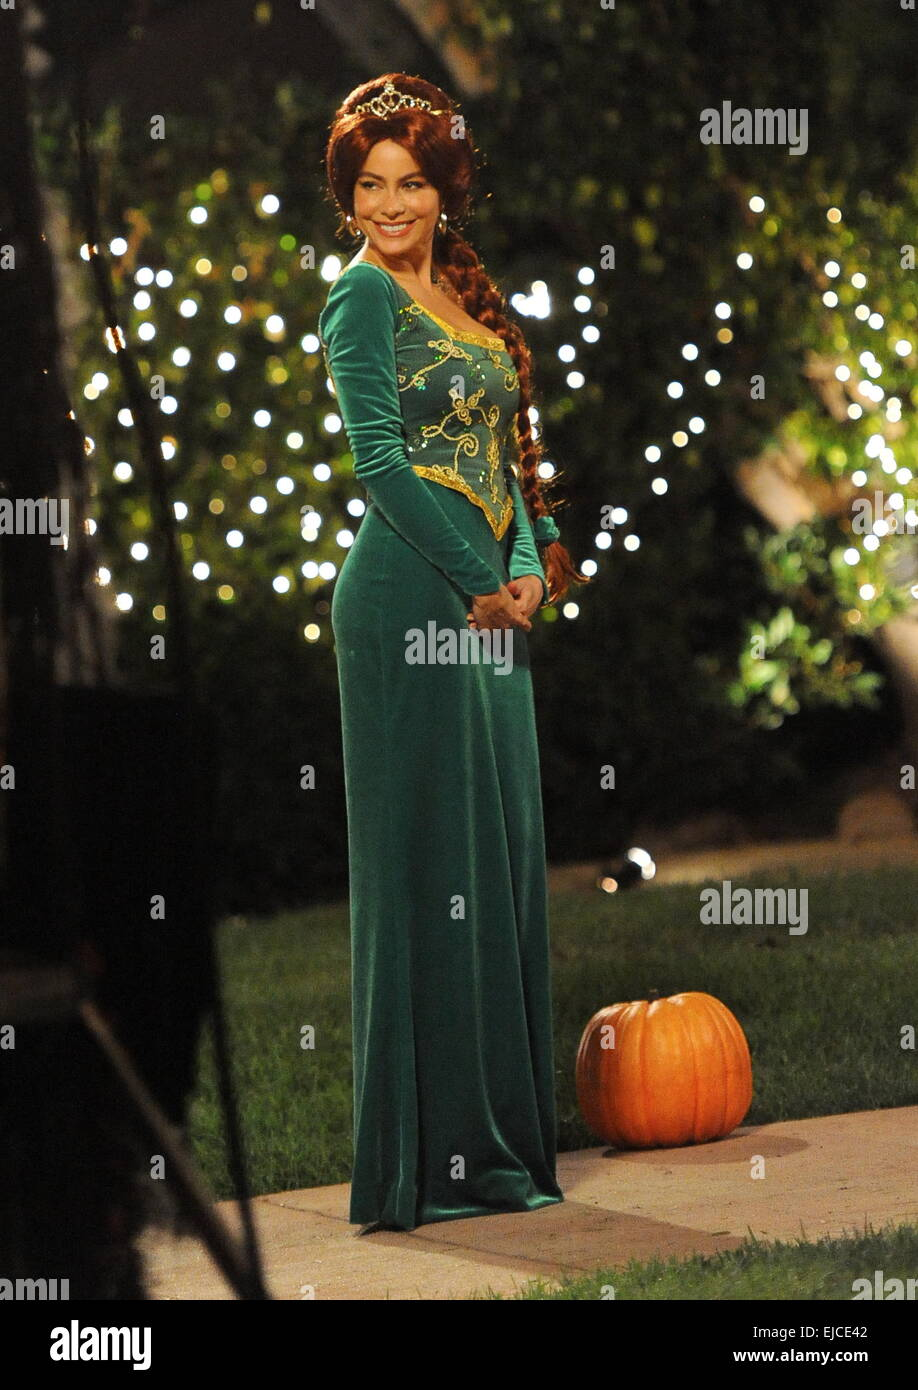 Sofia Vergara Wears A Princess Fiona From Shrek Costume On The Set Of Stock Photo Alamy